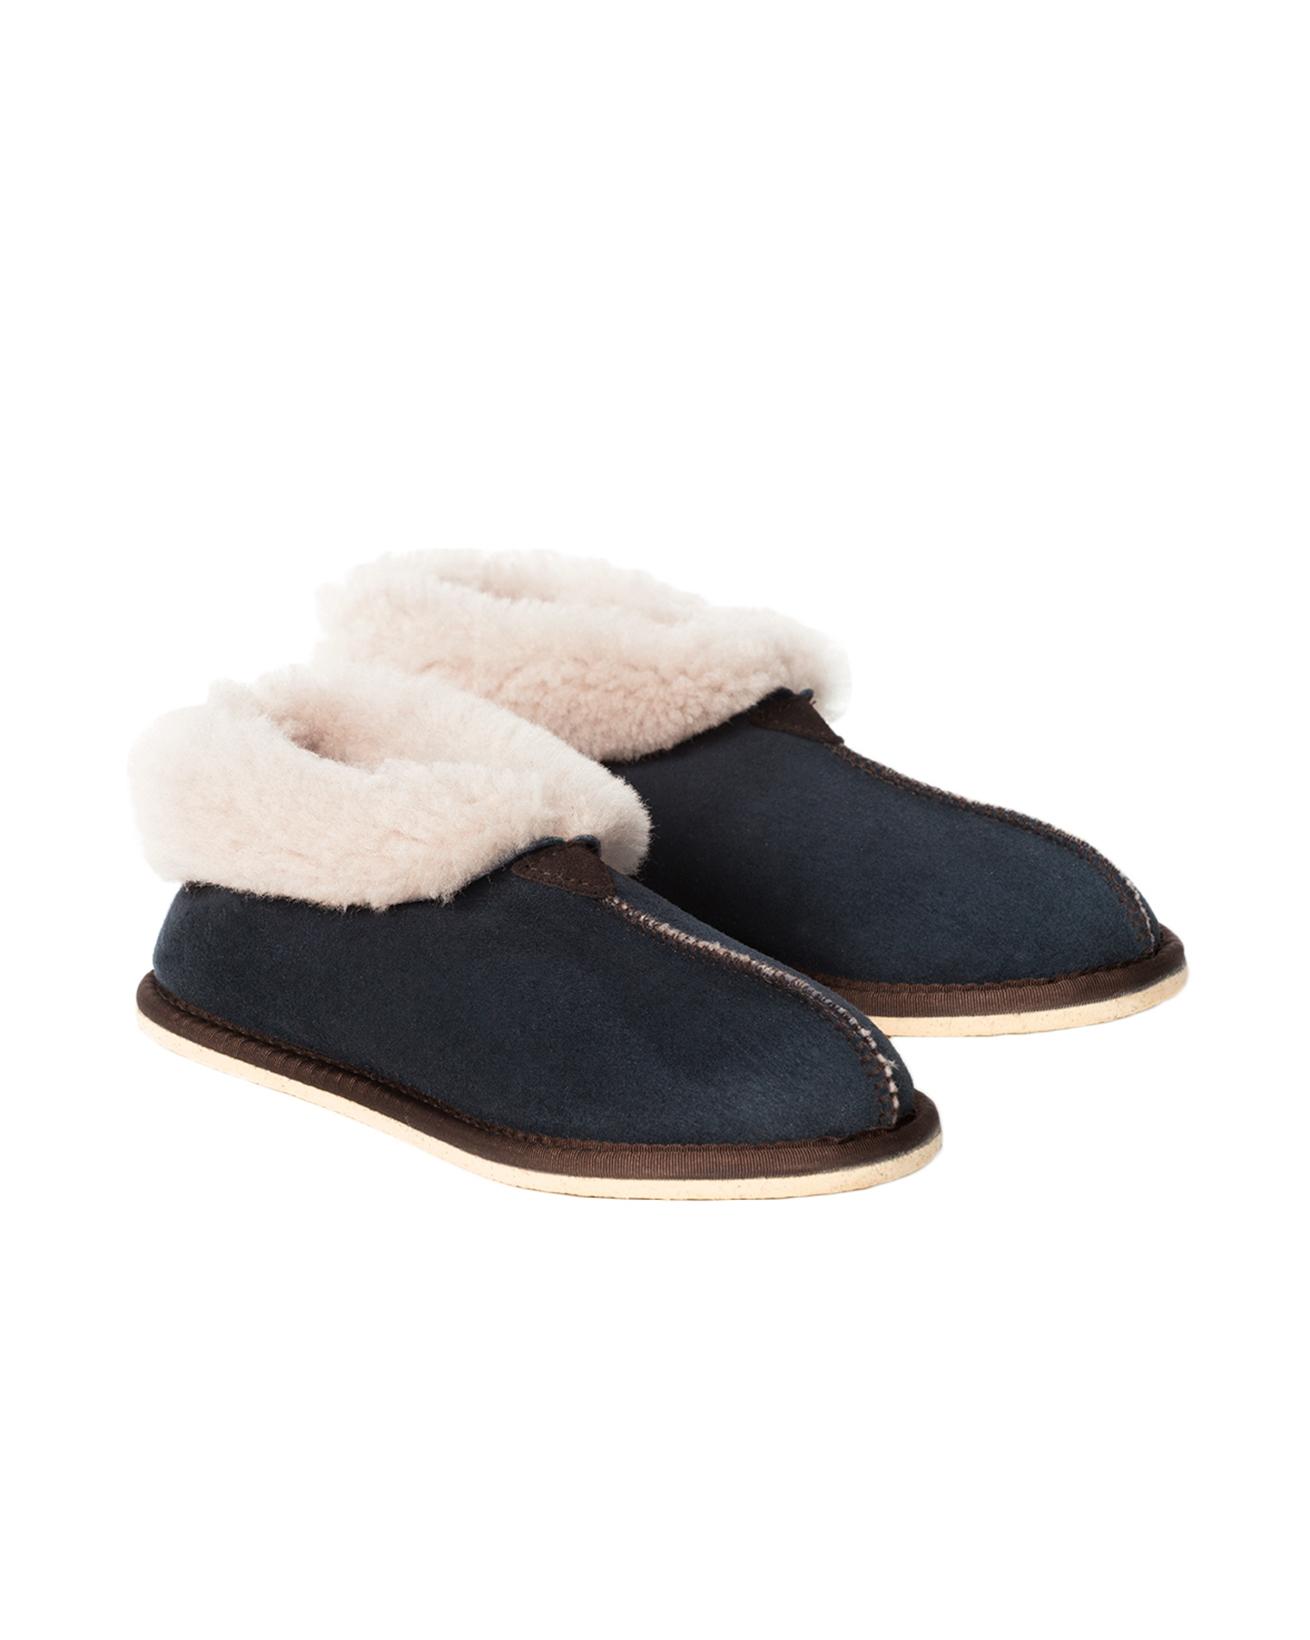 Ladies Bootie Slipper - Size 4 - Blue Iris - 1577